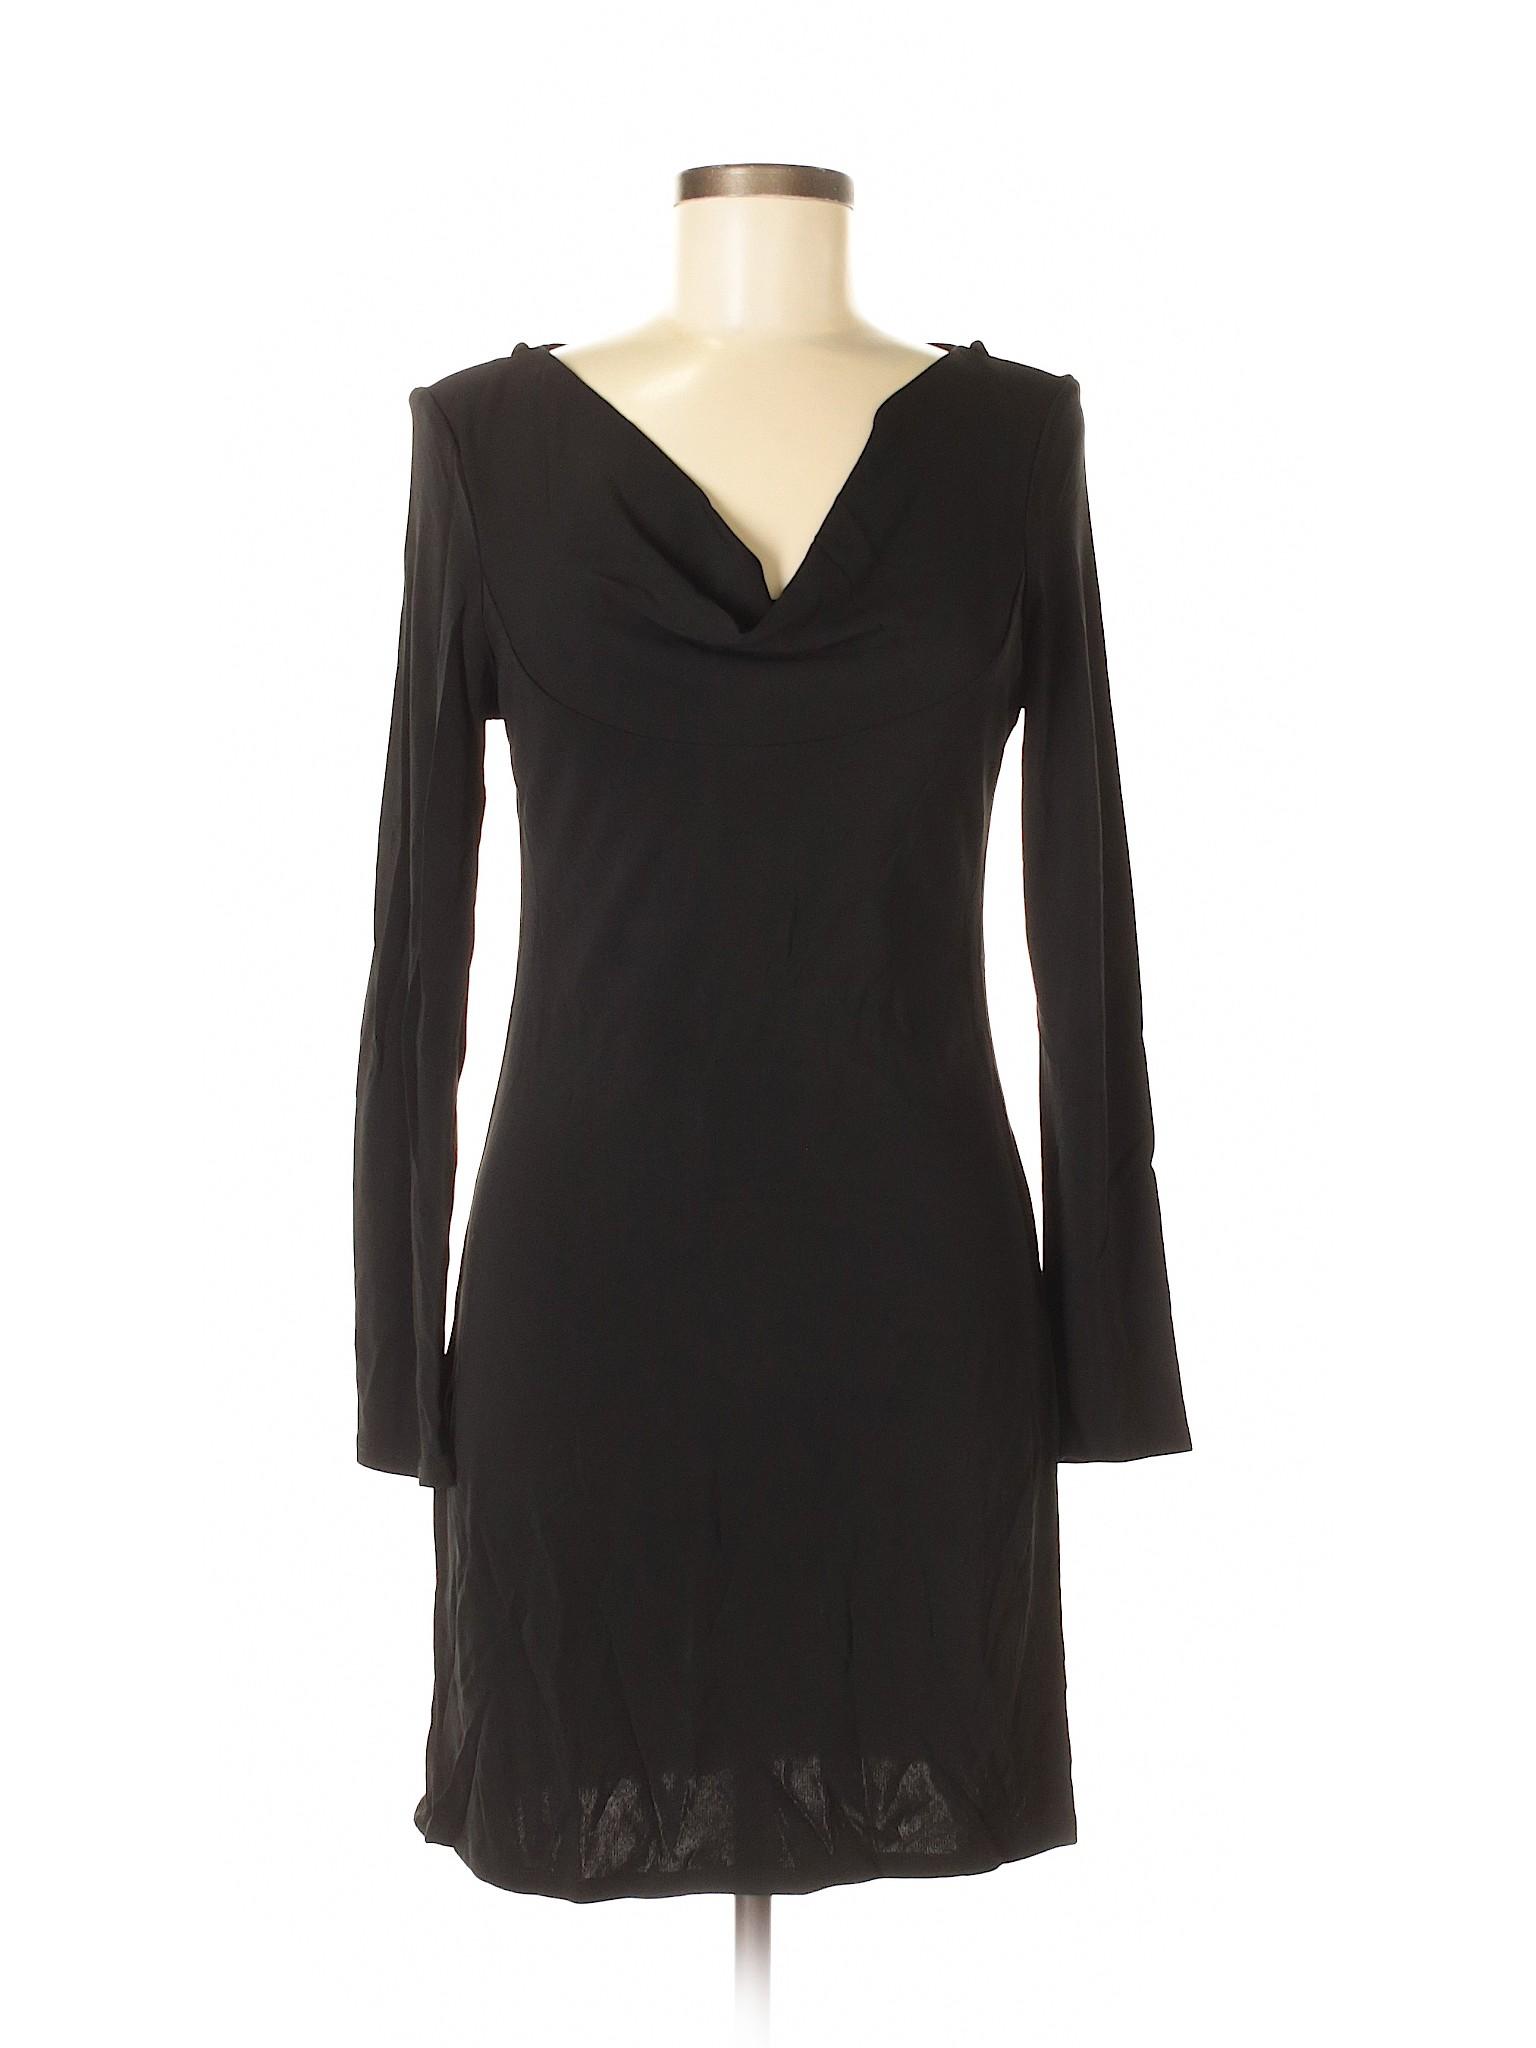 Casual Selling Dress Concepts International INC wwqR4tF